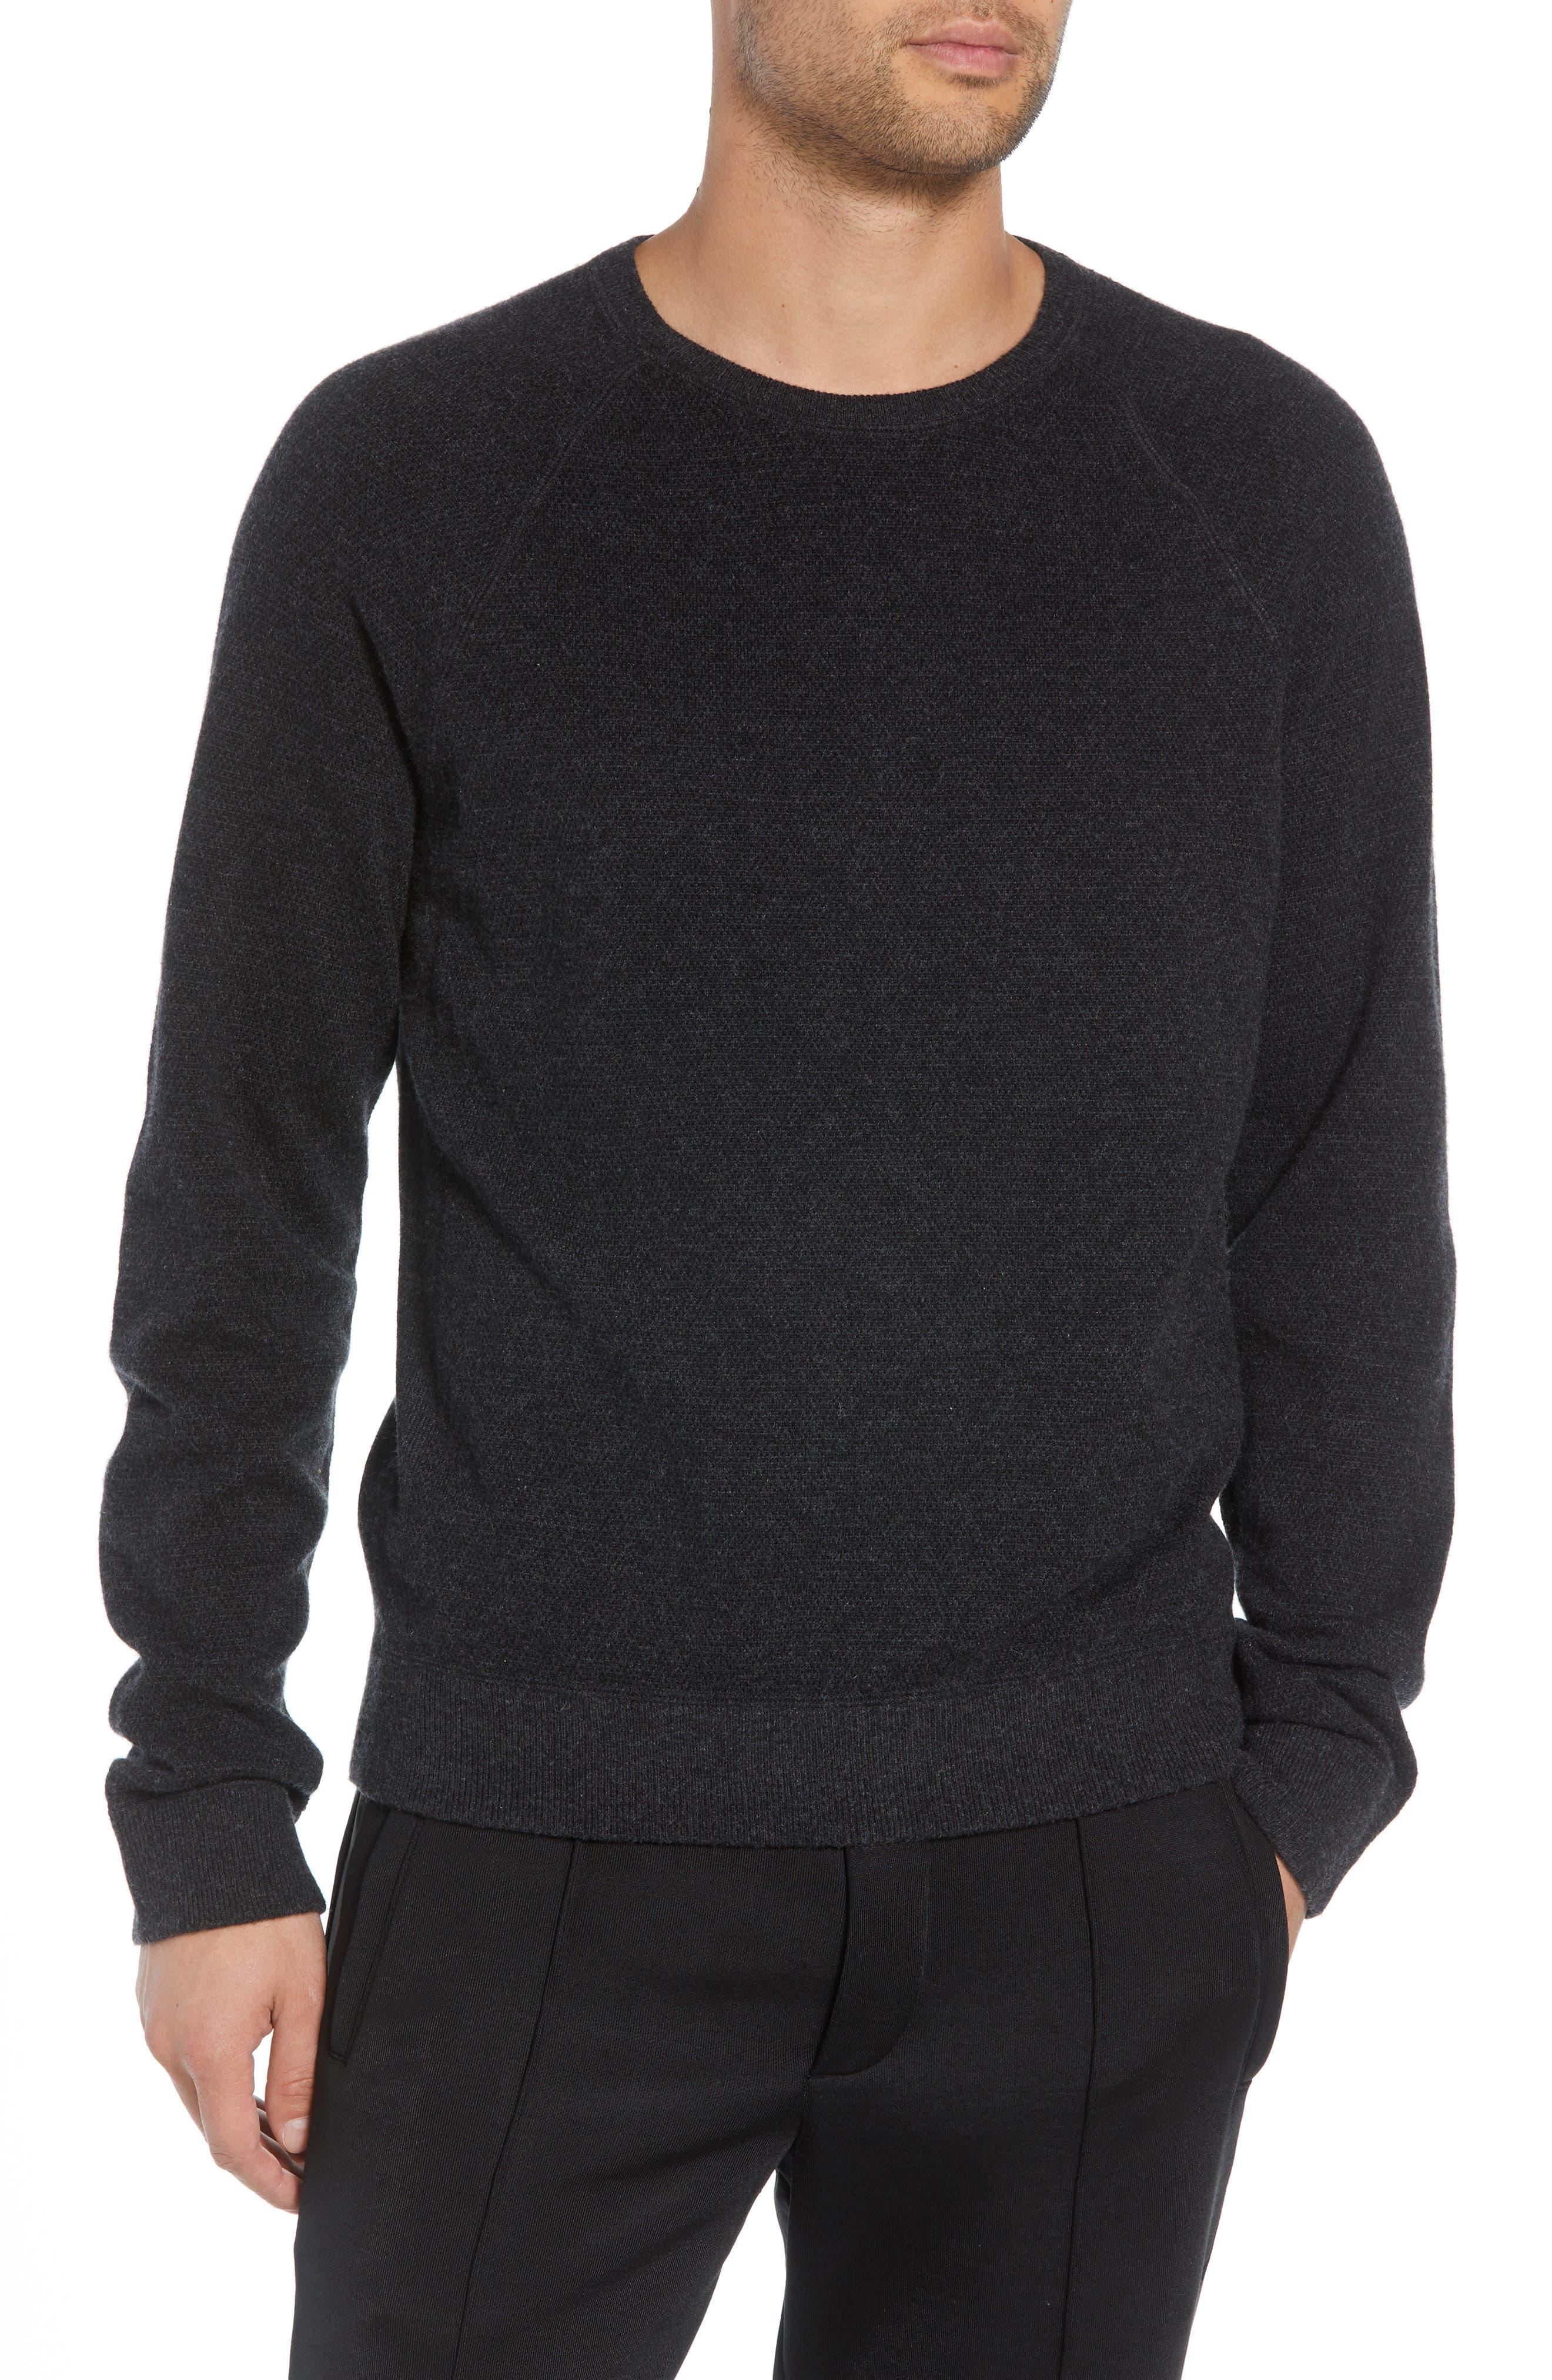 Bird's Eye Sweater,                             Main thumbnail 1, color,                             H CHARCOAL/ BLACK